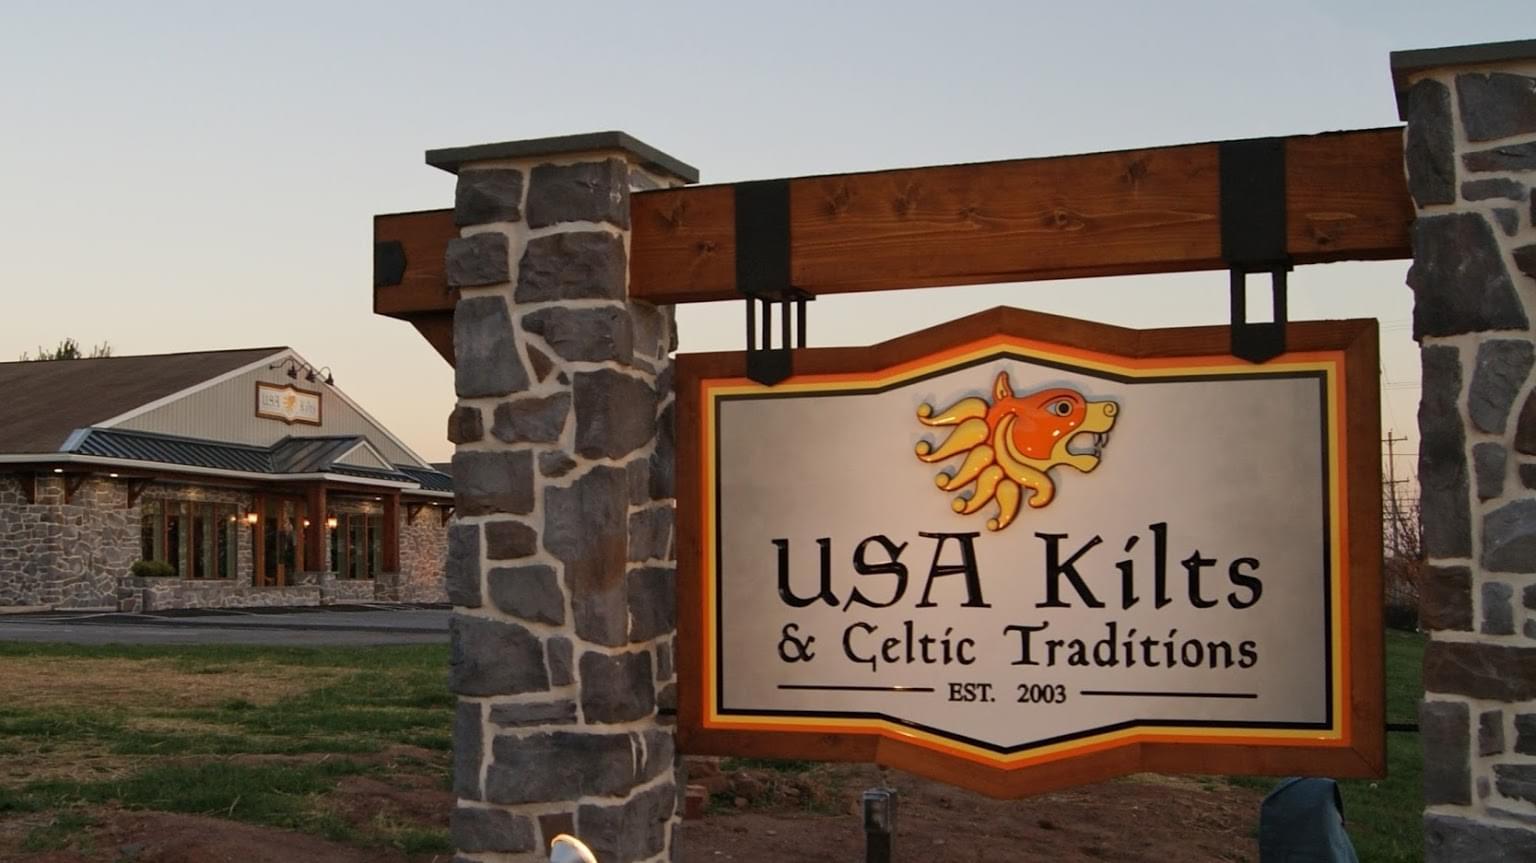 USA Kilts Spring City PA sign